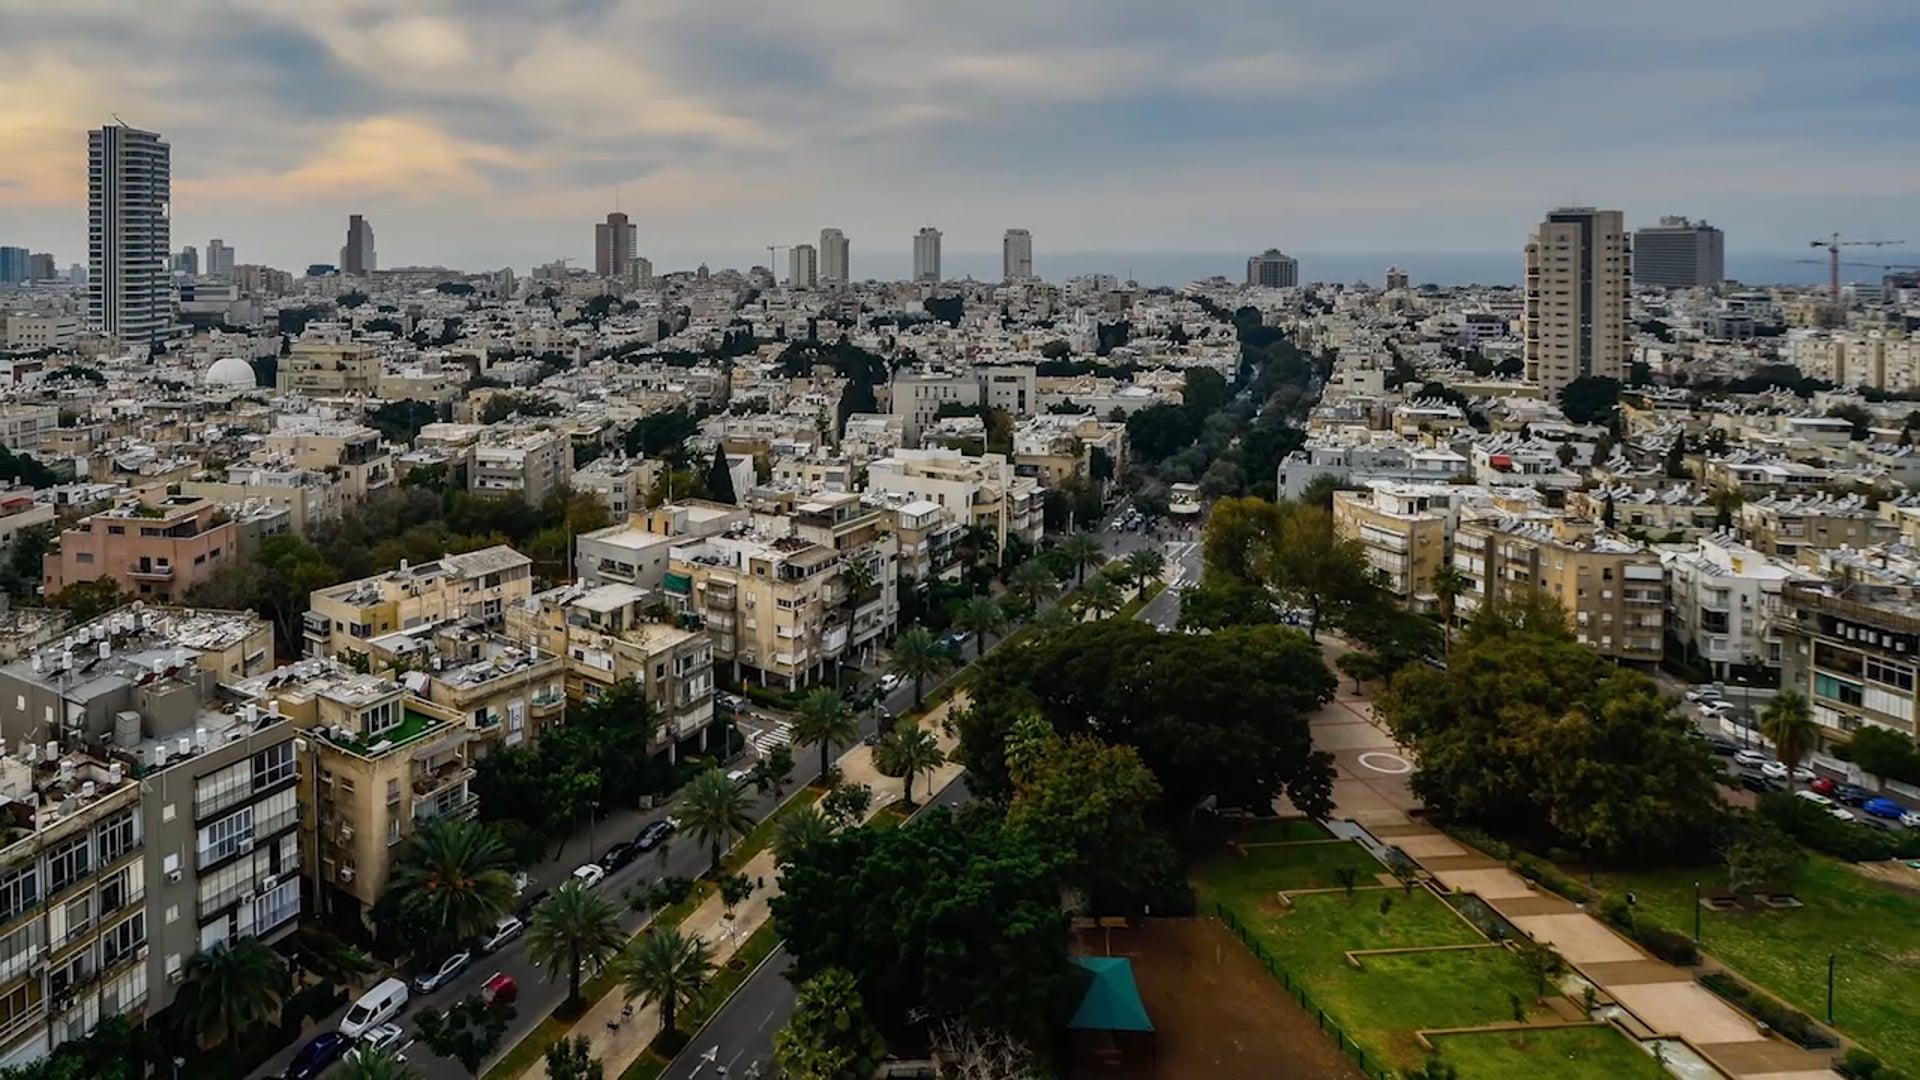 City_Hall_/ Ben Gurion Blvd